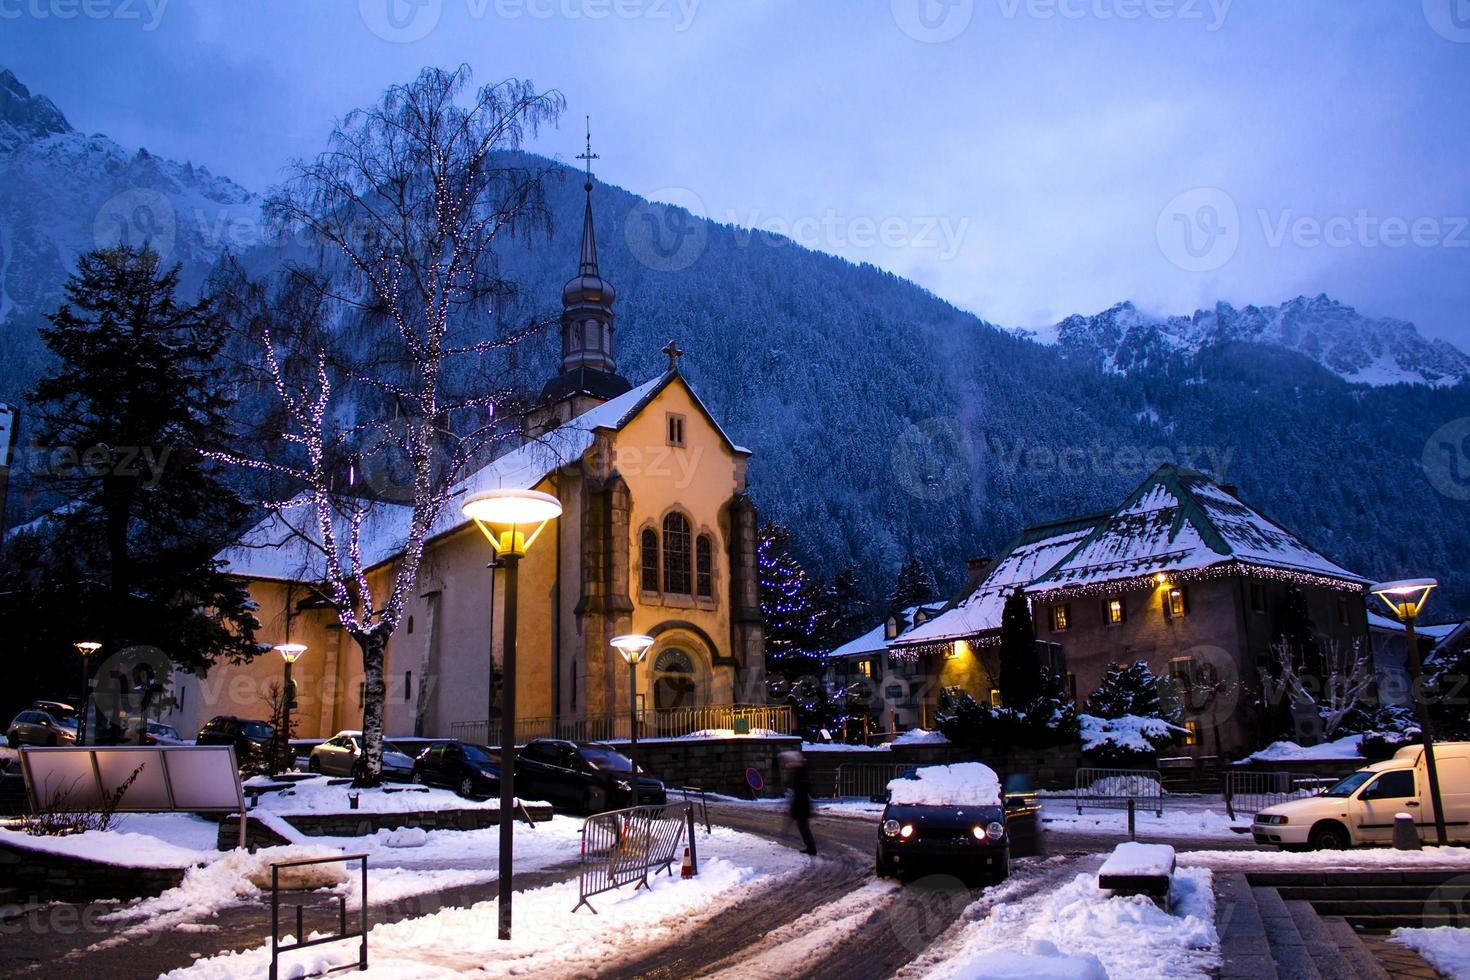 Chamonix town photo